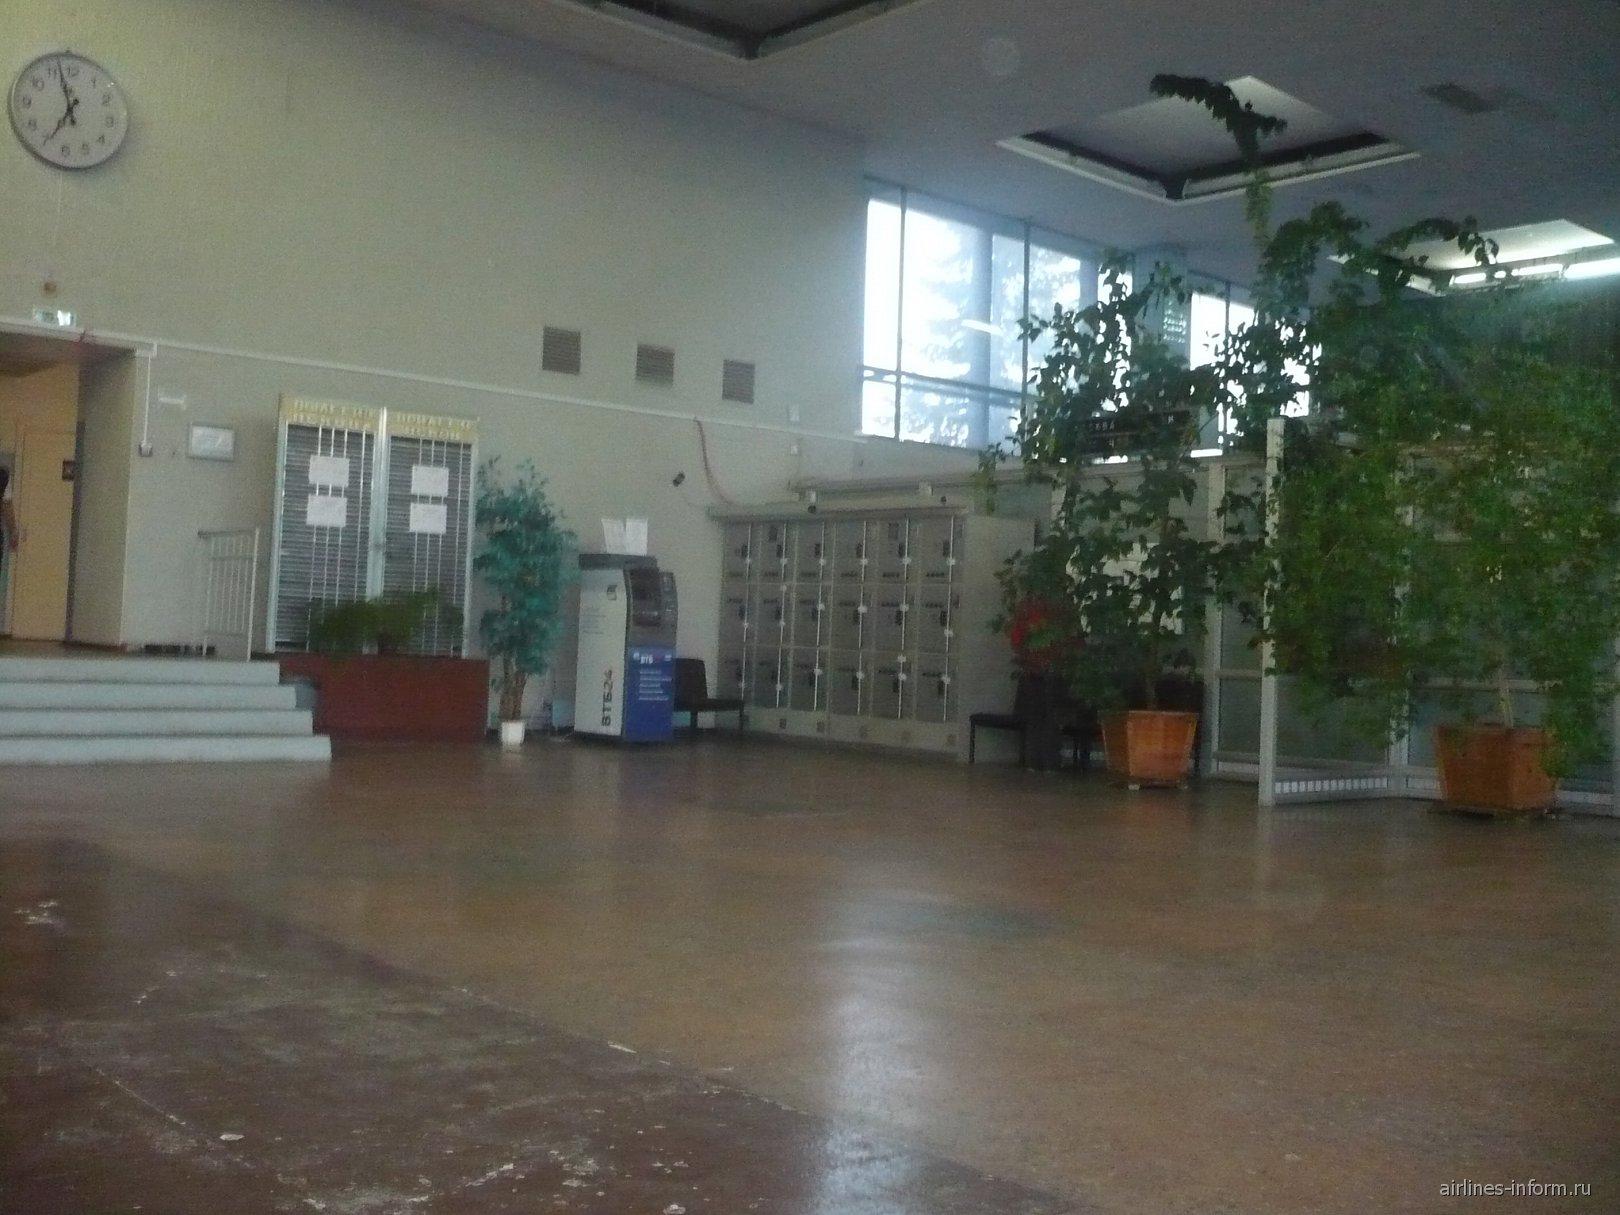 В аэровокзале аэропорта Пскова